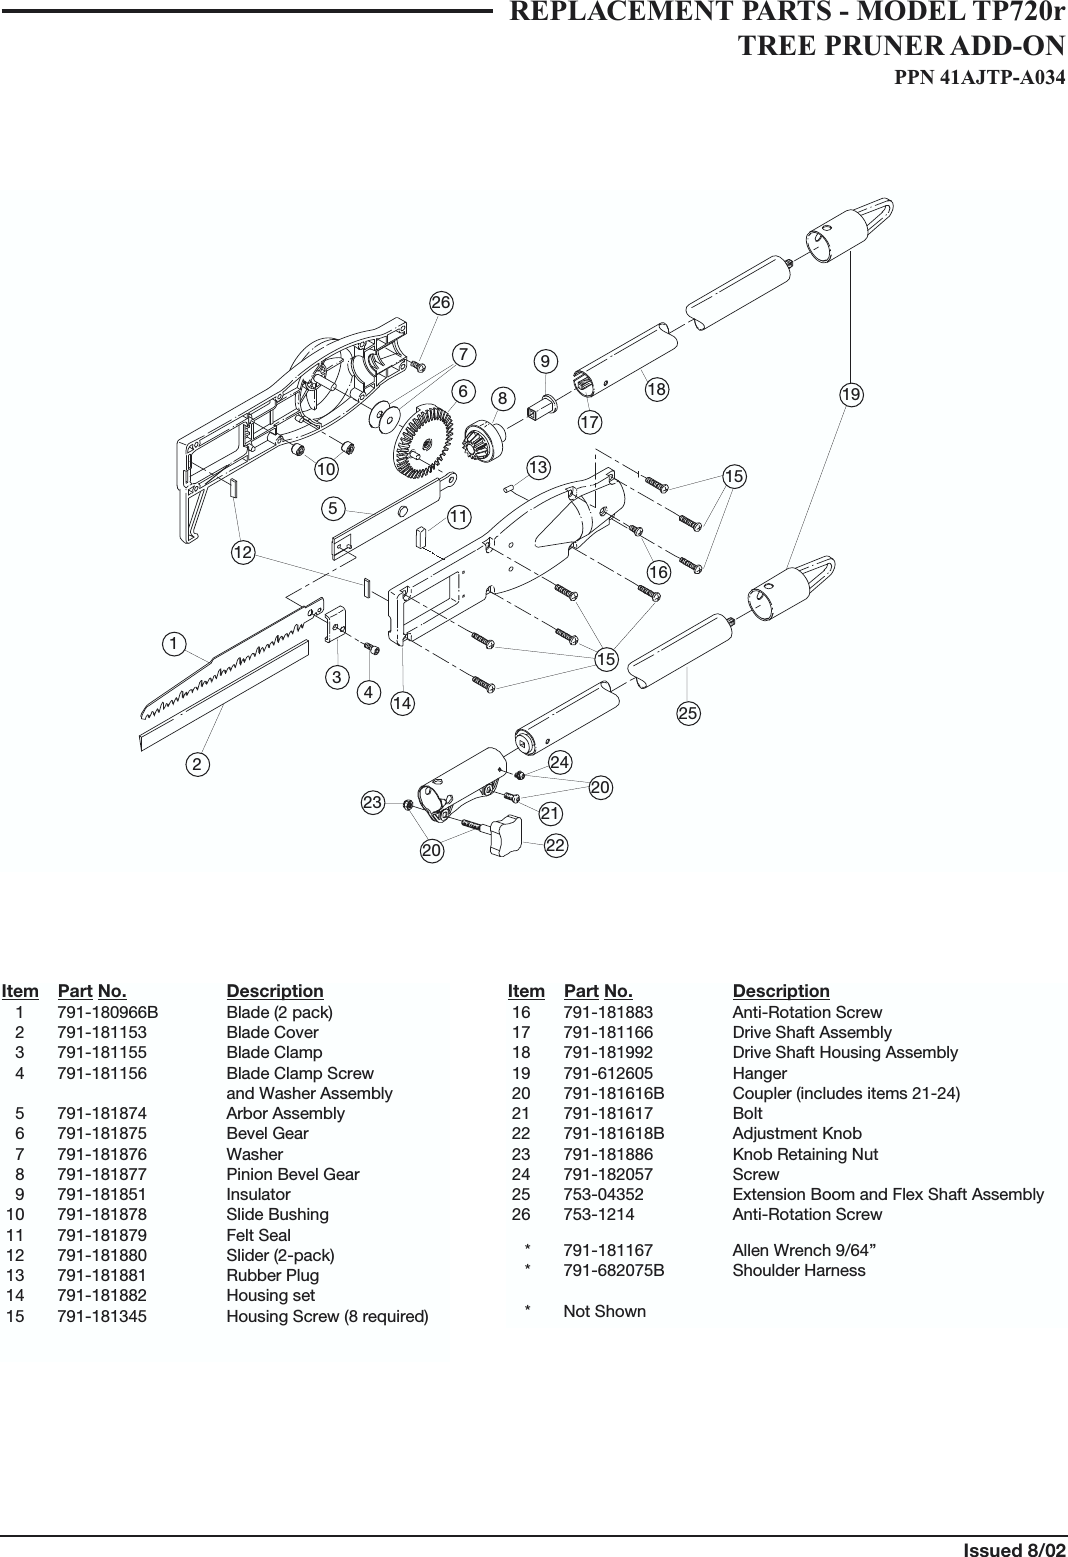 Bolens Tp720R Illustrated Parts List Combined Ryobi Pl '03